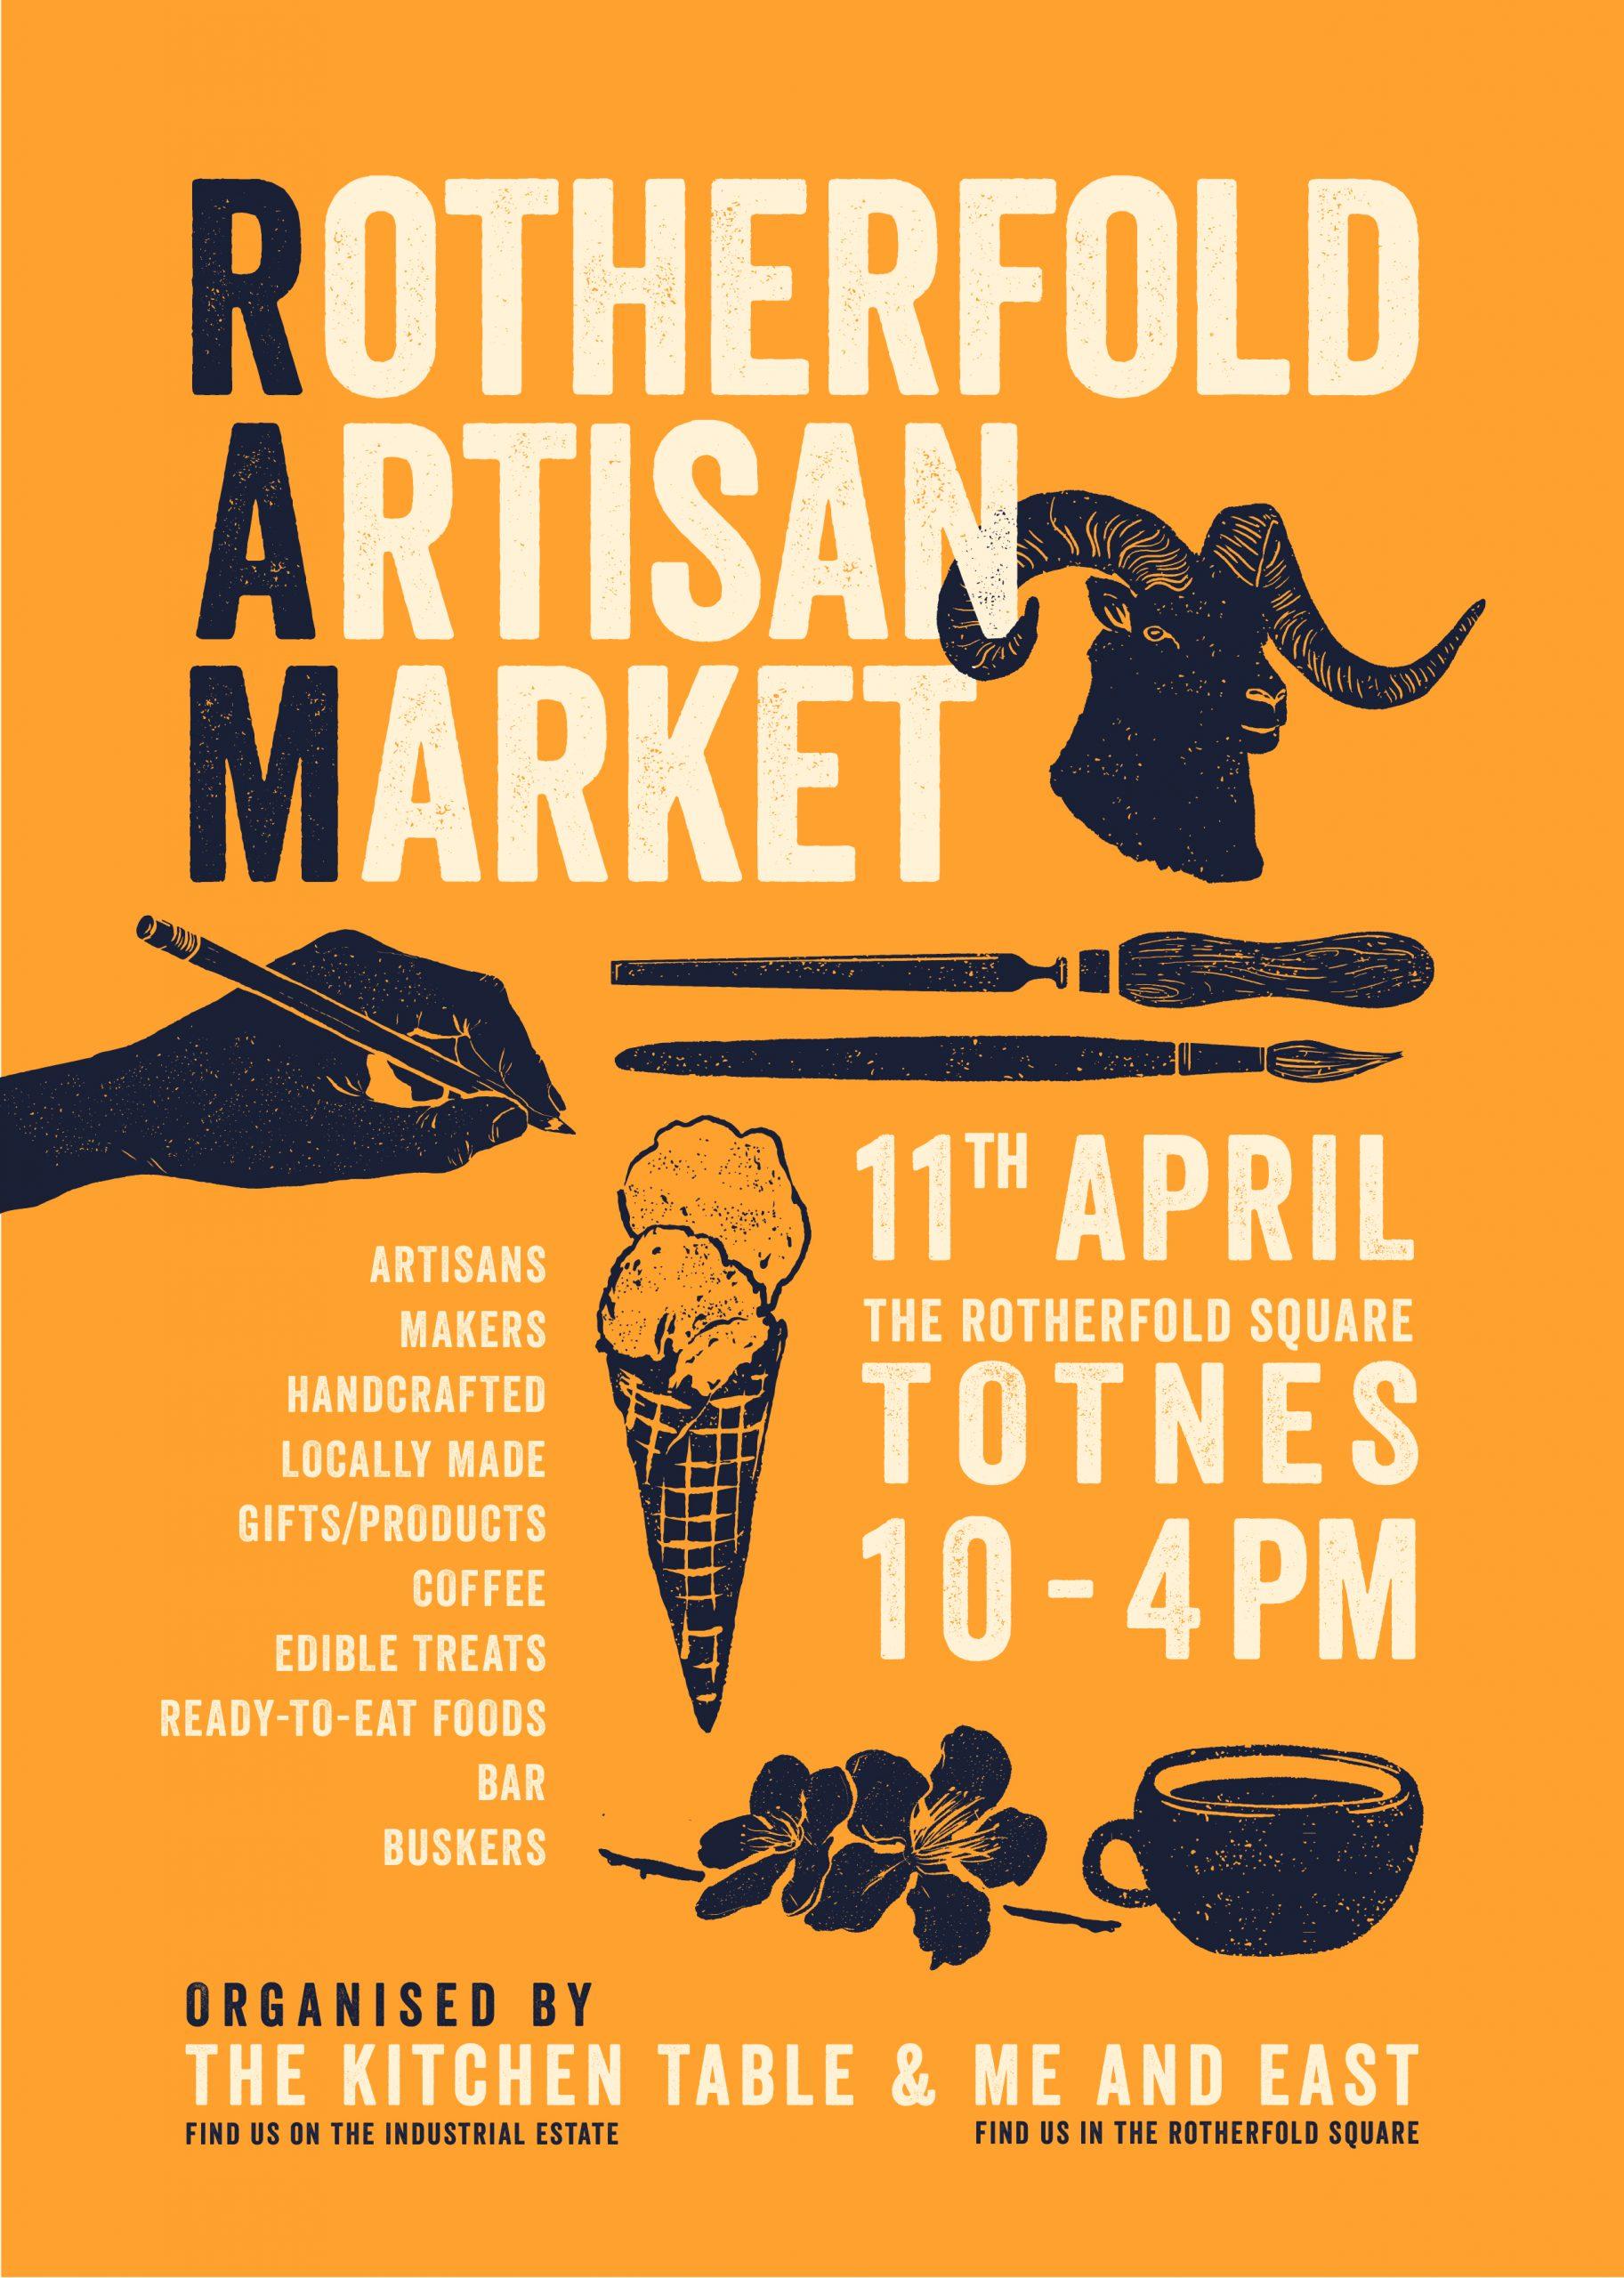 Rotherfold Artisan Market Poster